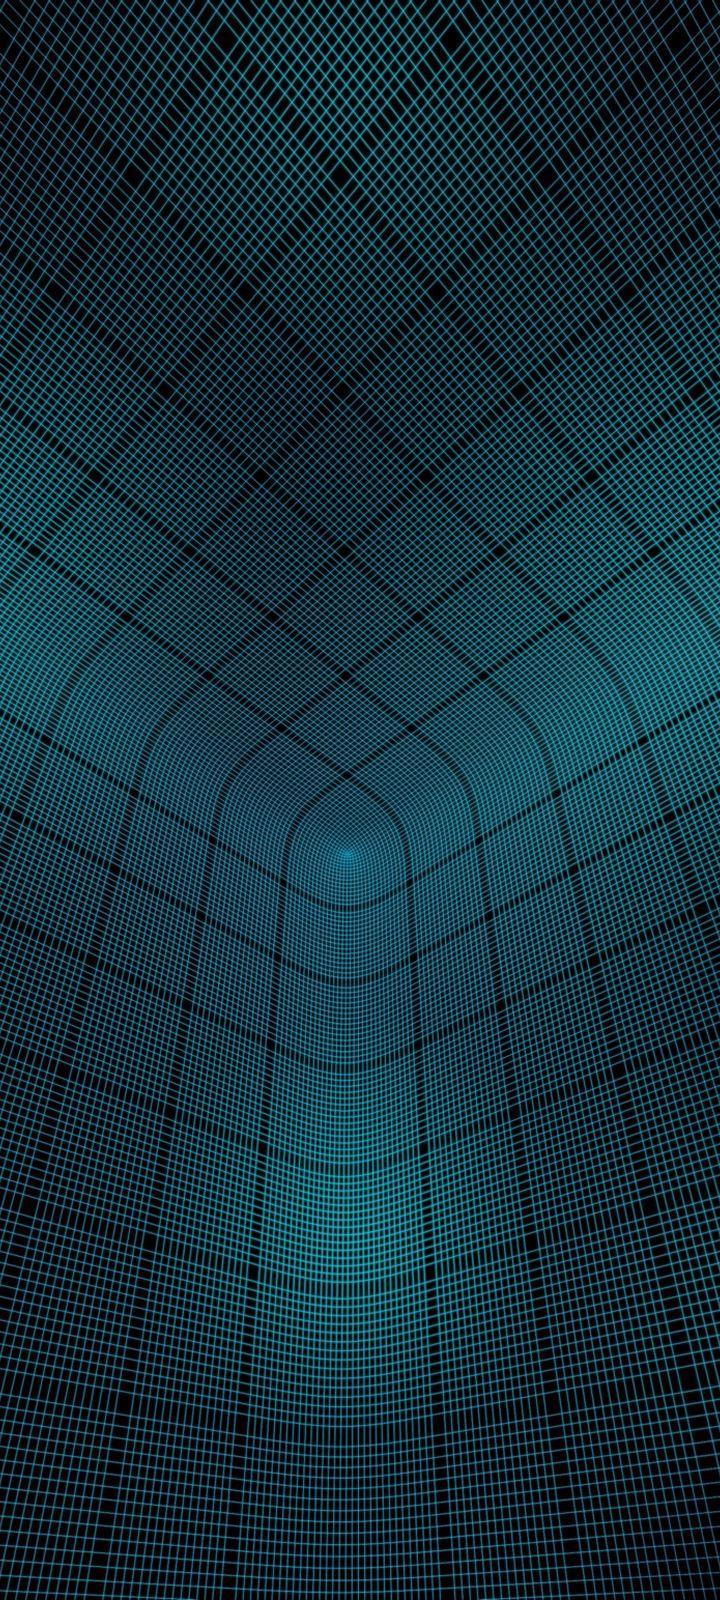 Mesh Optical Illusion Illusion 3d Wallpaper 720x1600